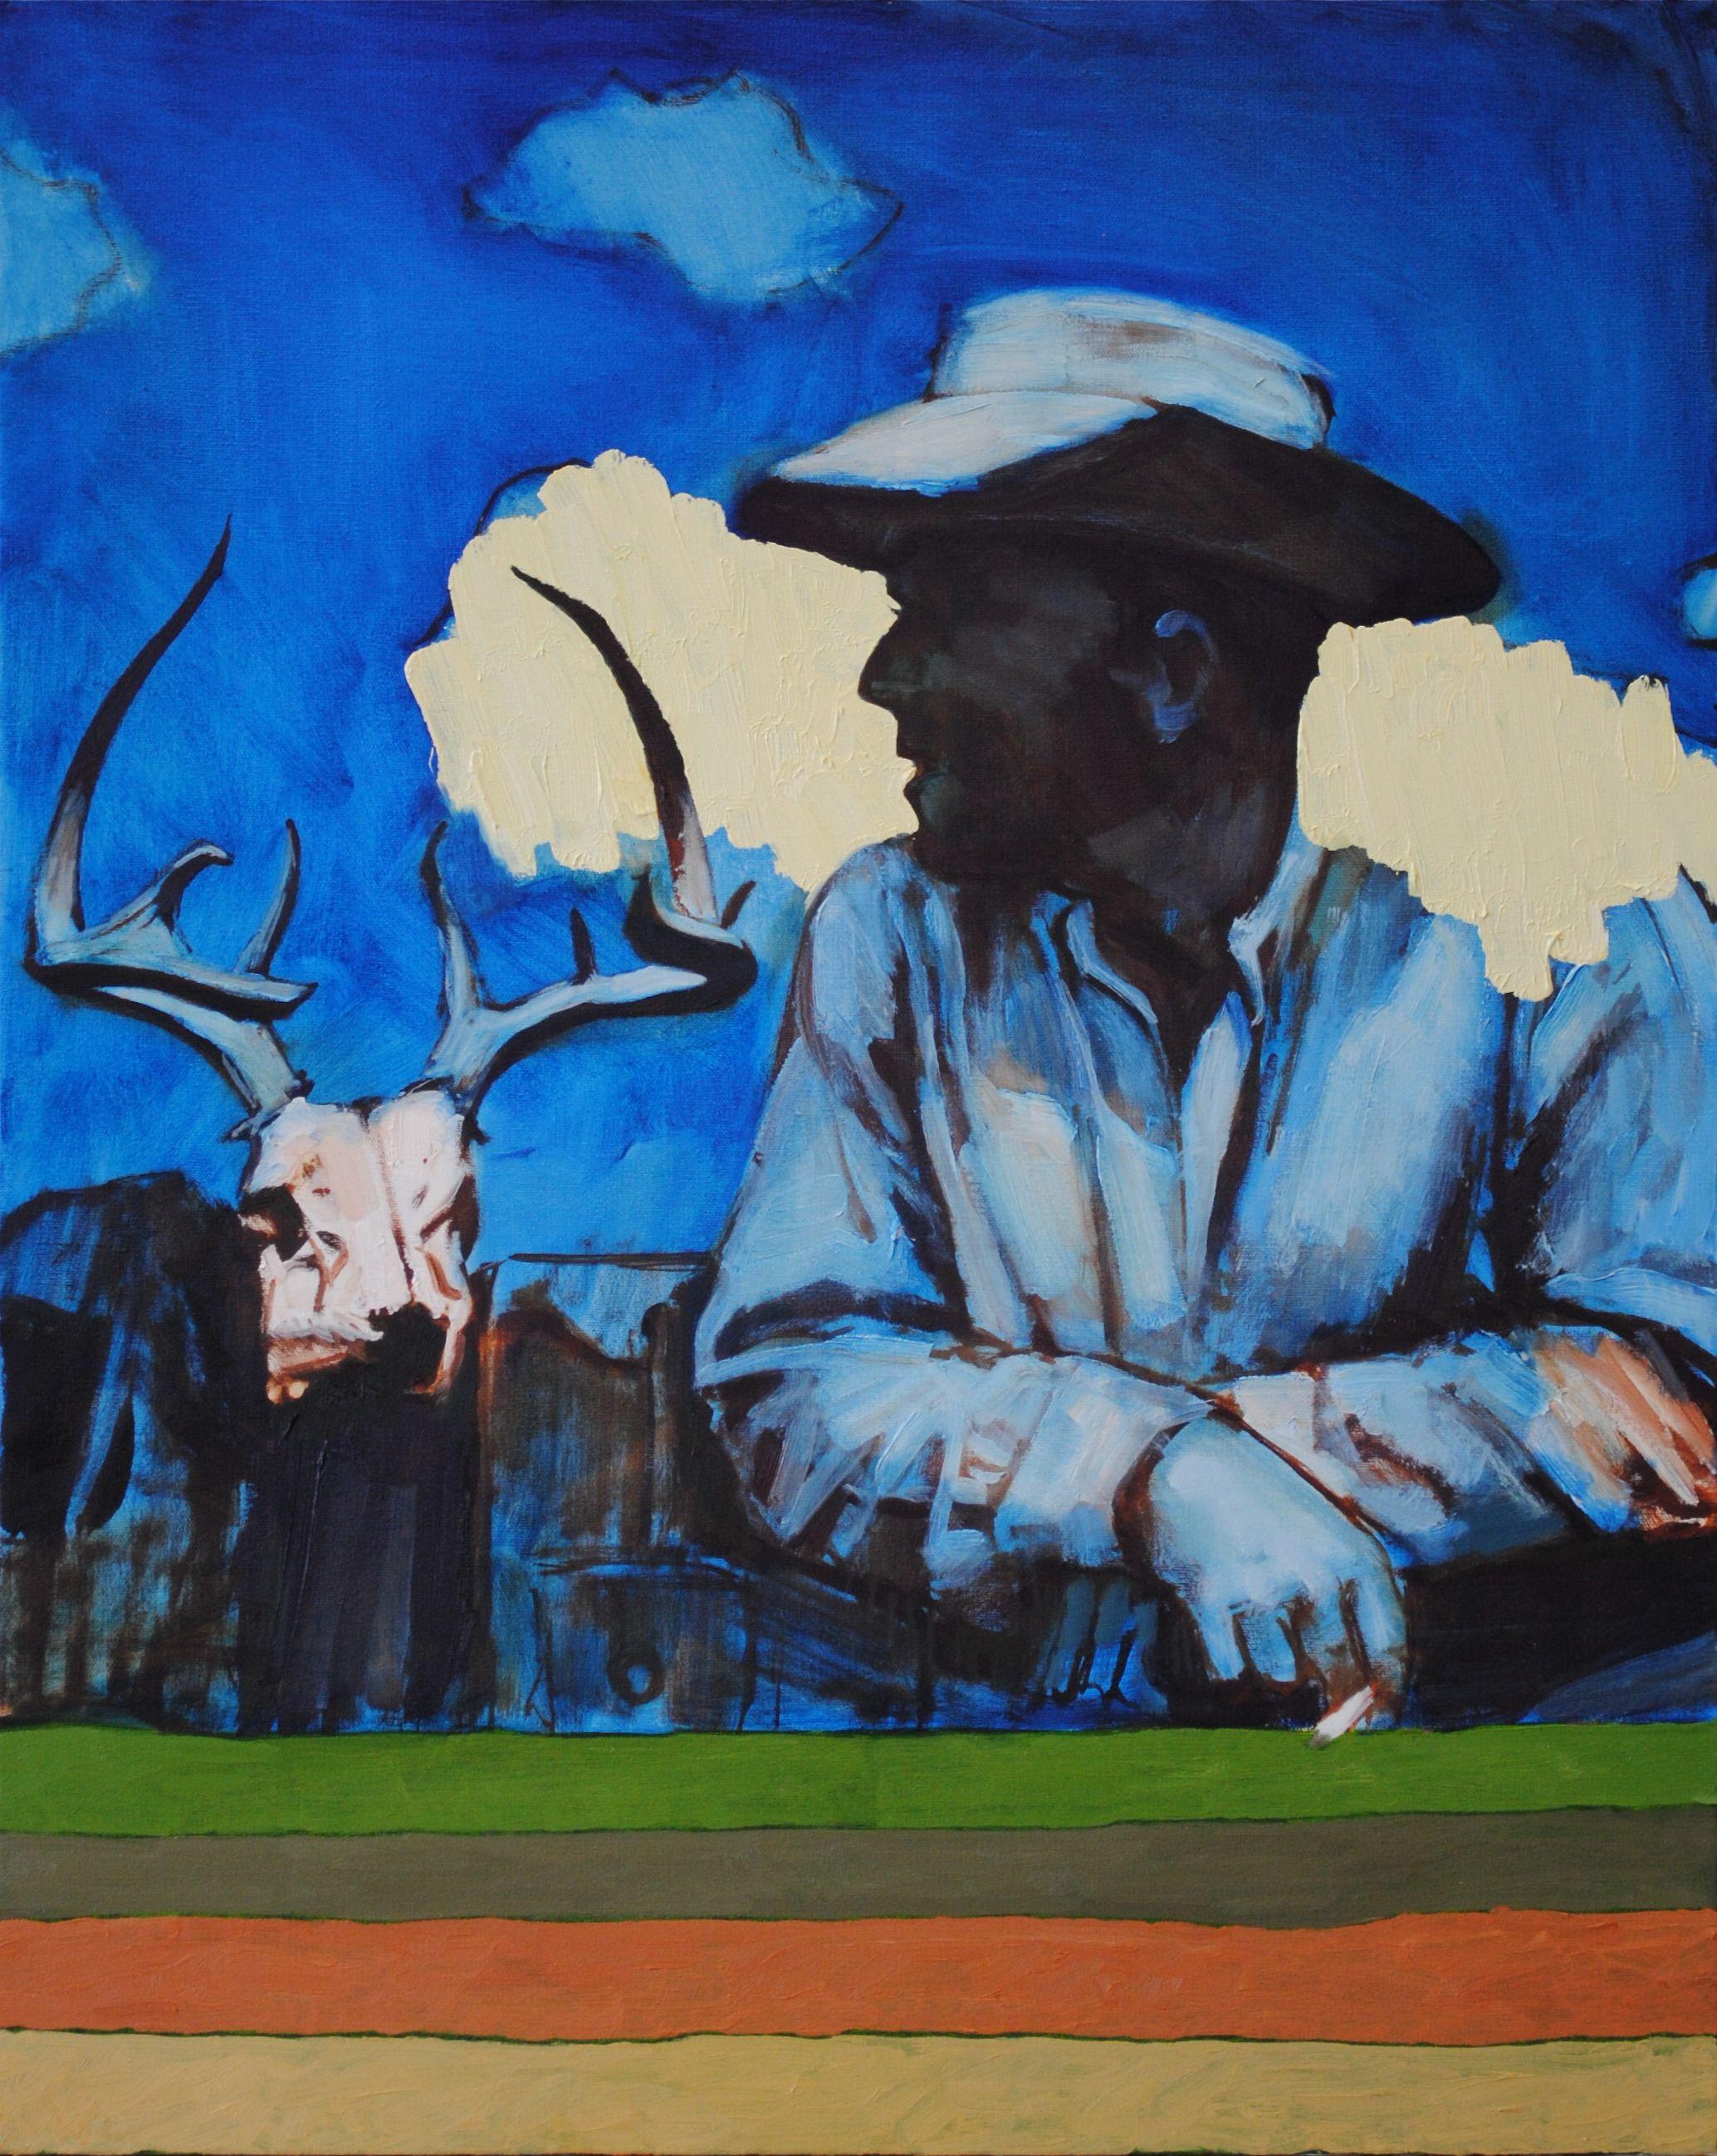 Matt Kleberg Paintings Ranches Cows Oil Paintings